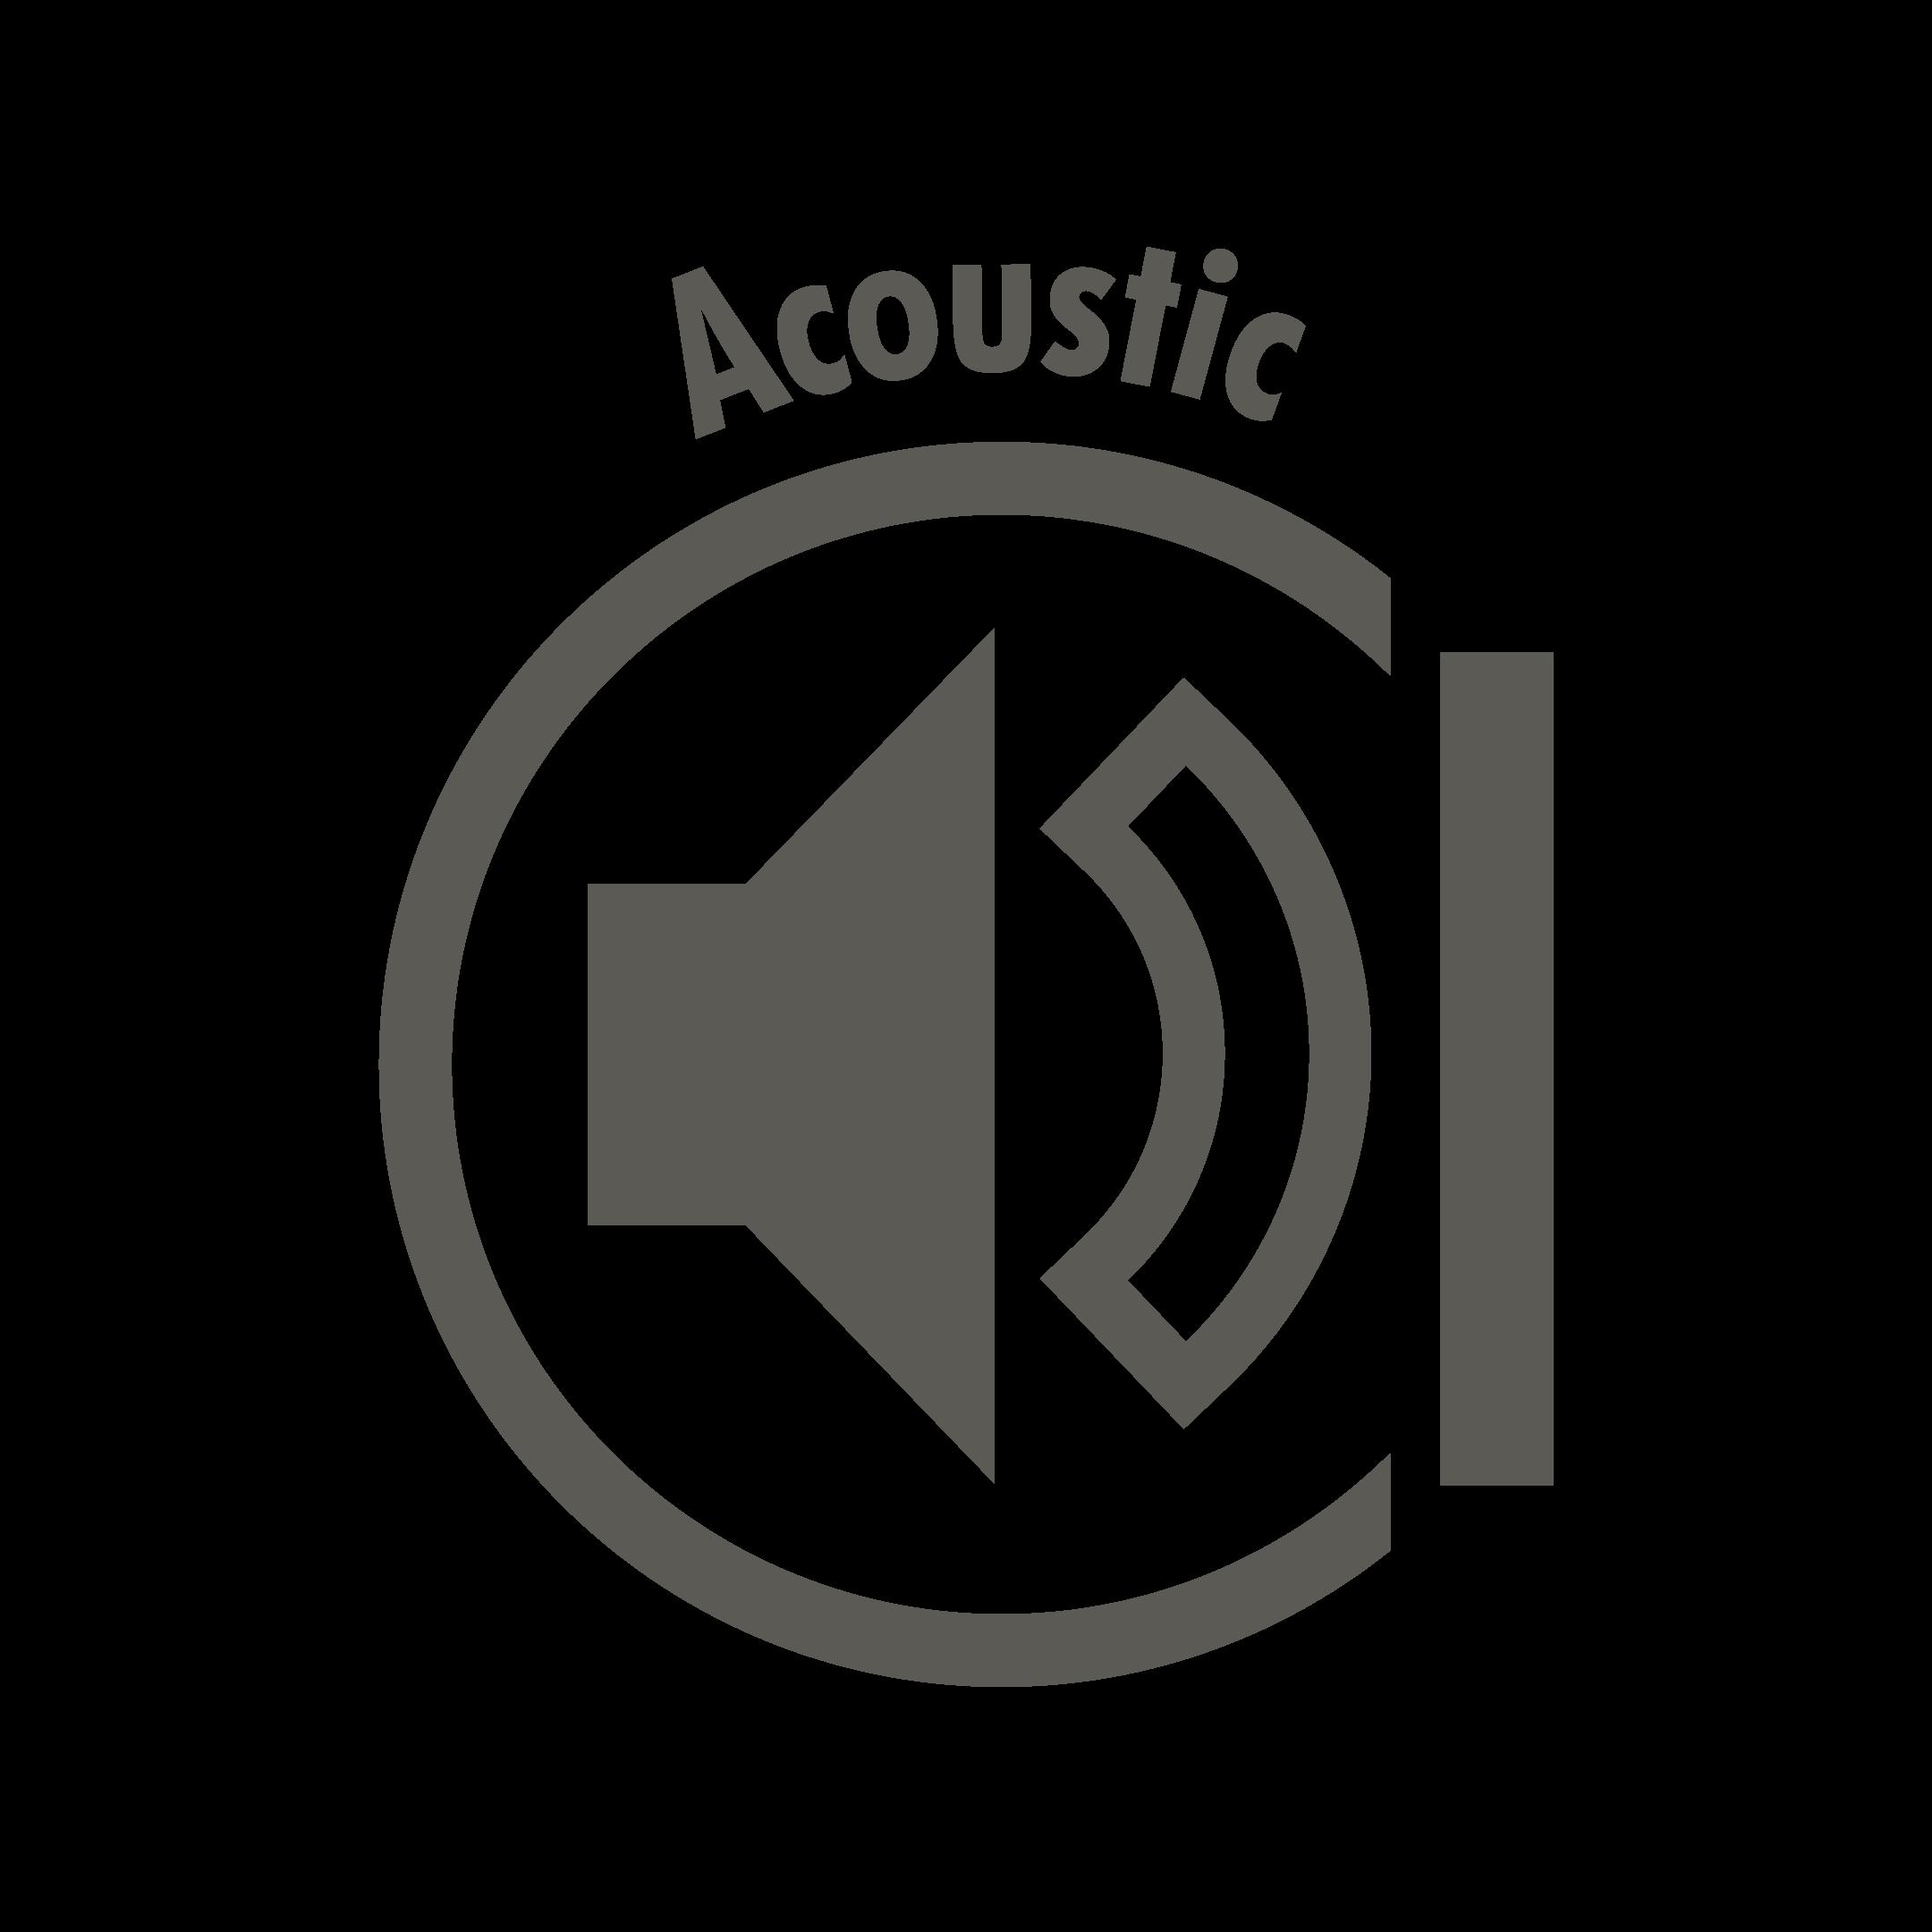 Acoustic Icon